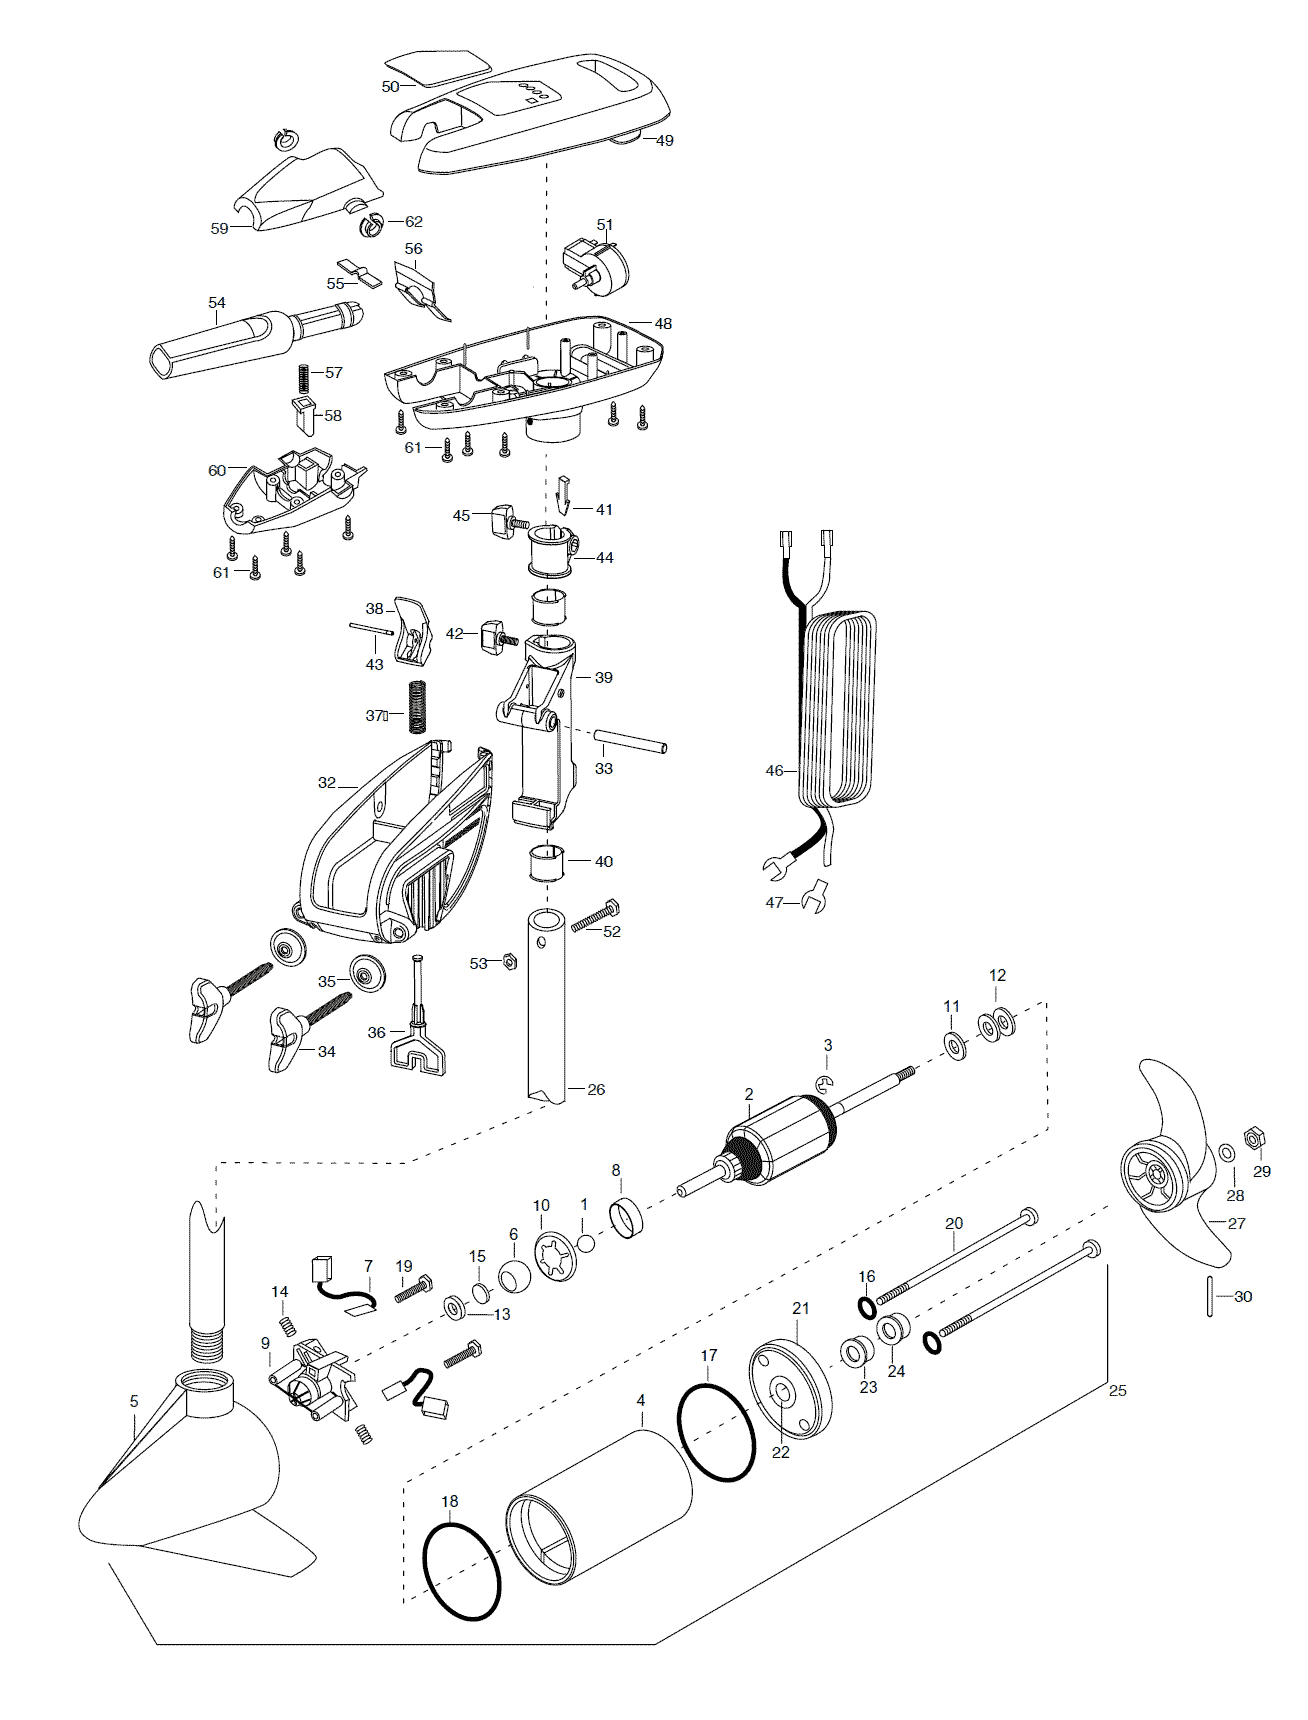 Minn Kota Turbo 65 Parts